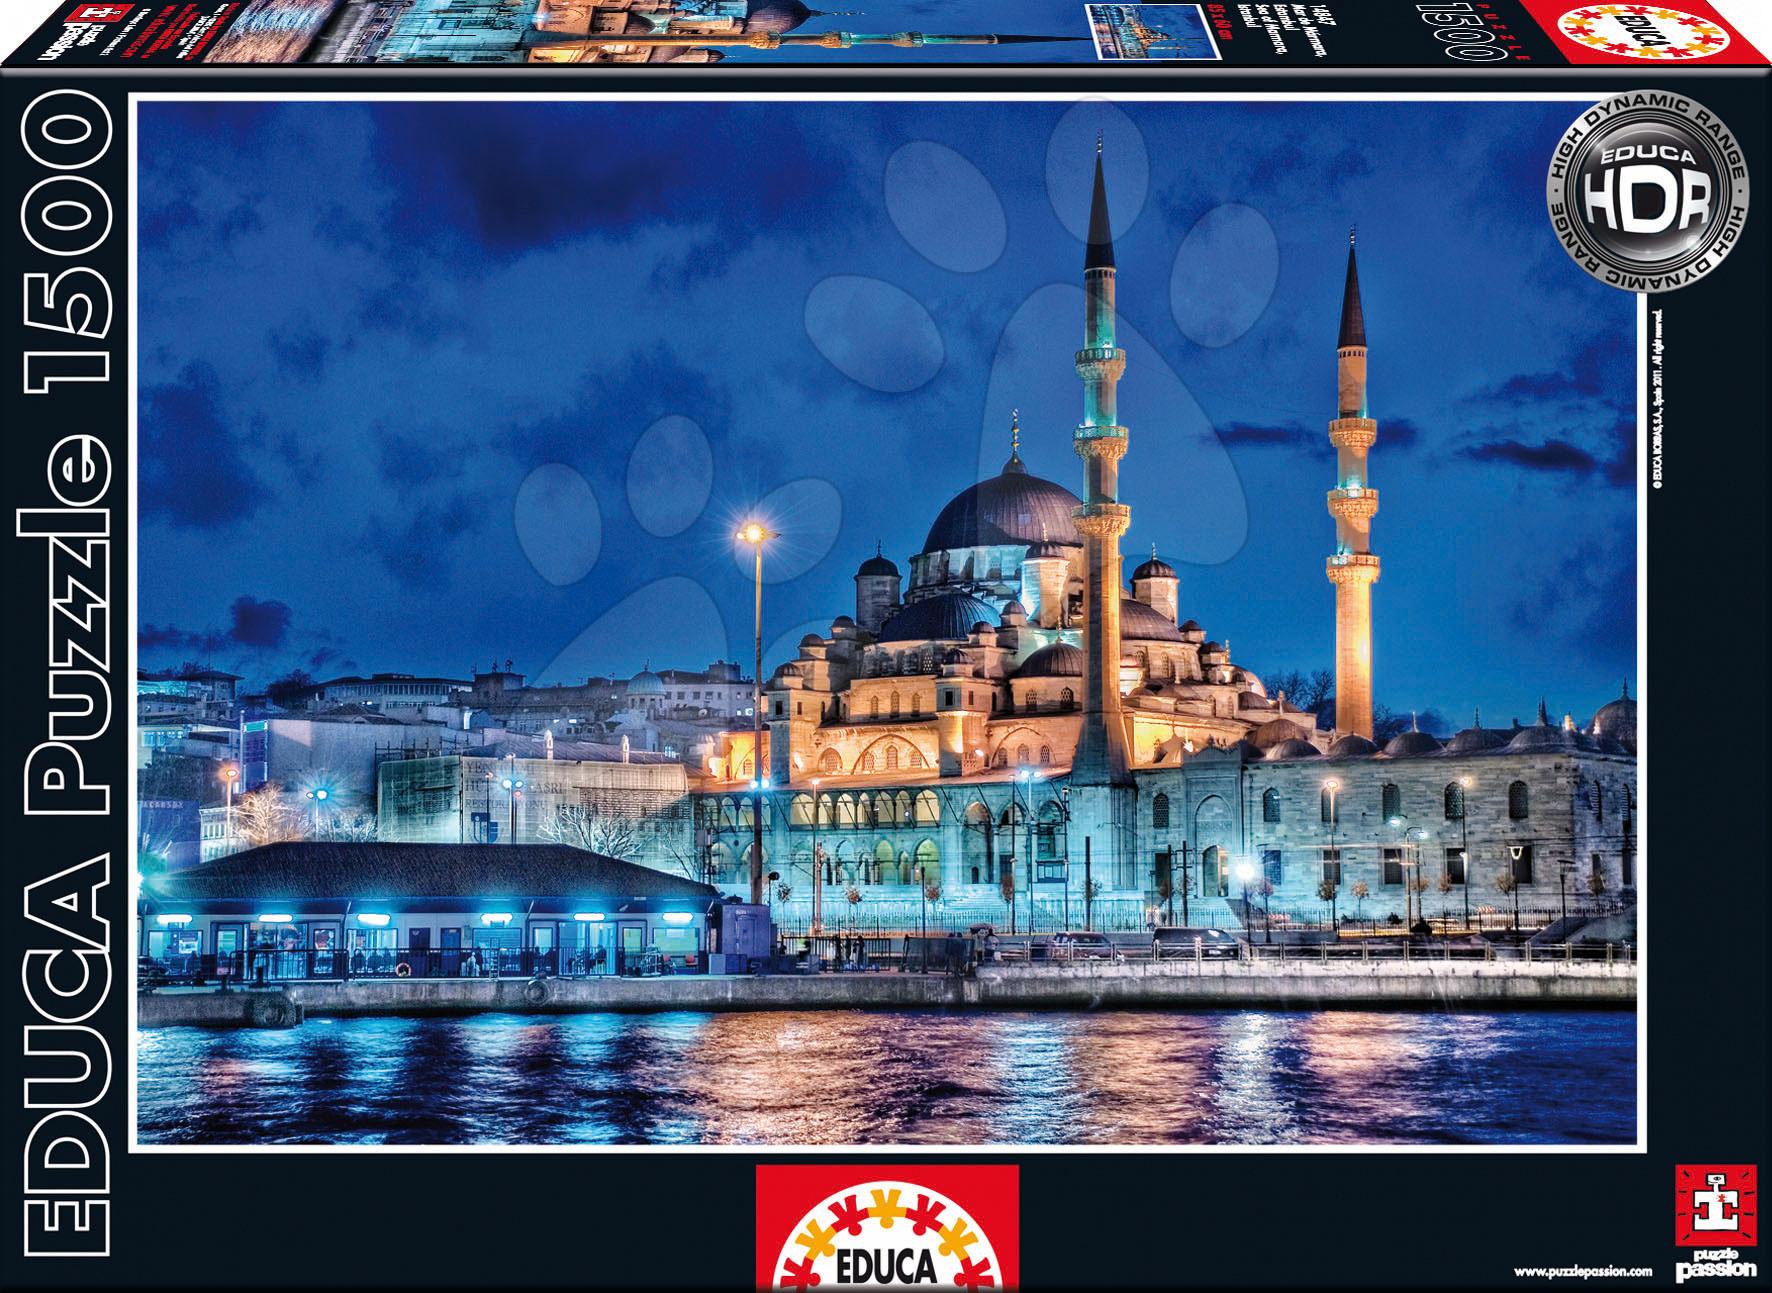 1500 delne puzzle - Educa 14847 PUZZLE 1500 delov Sea of Marmara / Istanbul / 85 x 60 cm + FIX PUZZLE LEPILO